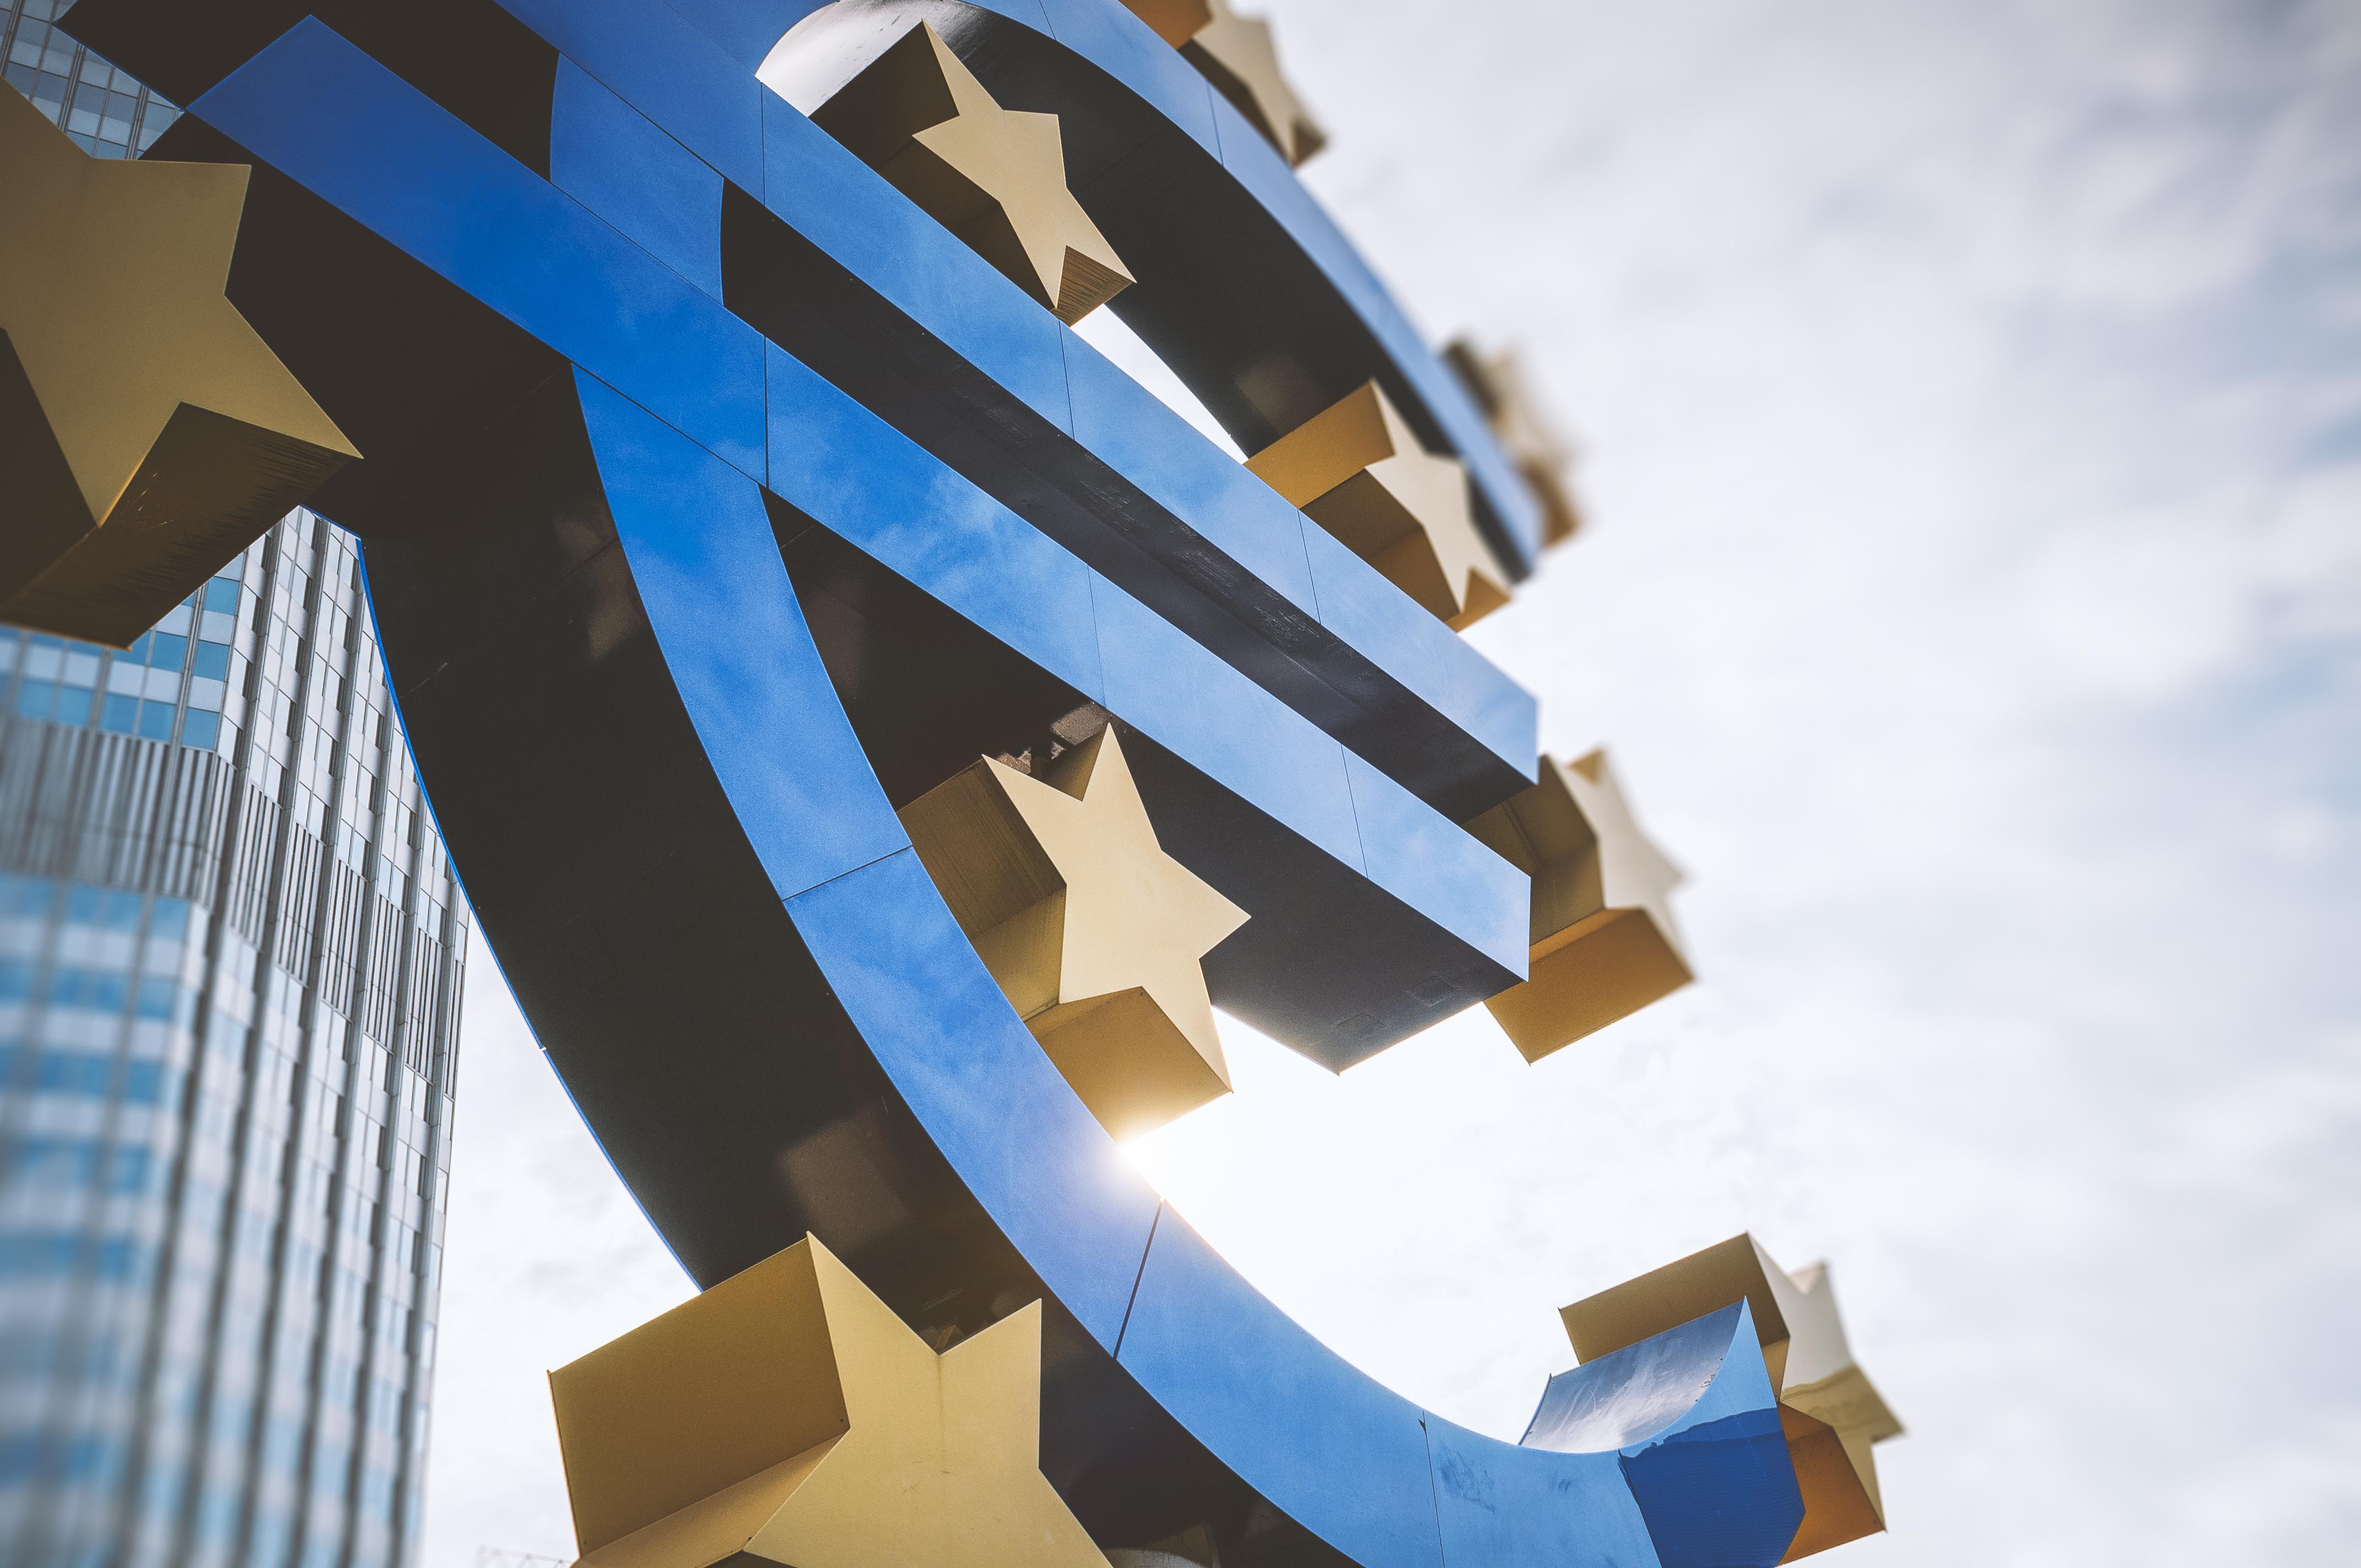 Euro sculpture, Frankfurt, Germany. Photo/Credit: instamatics/iStock.com